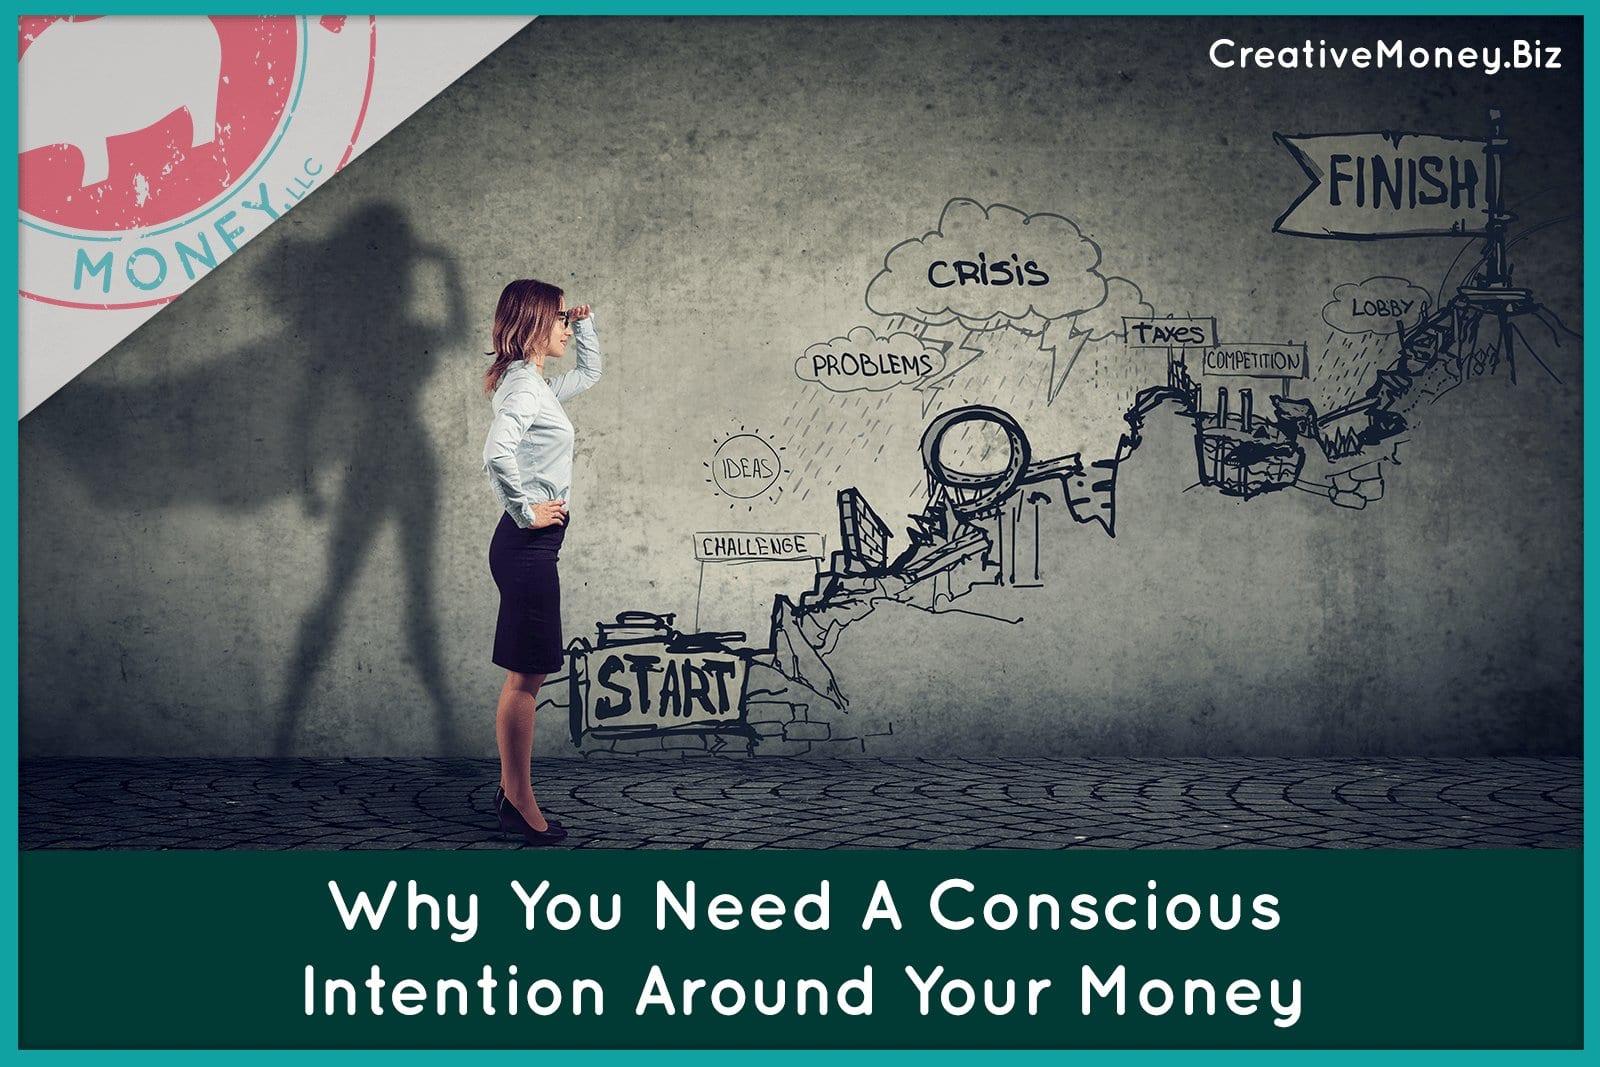 Intention around money